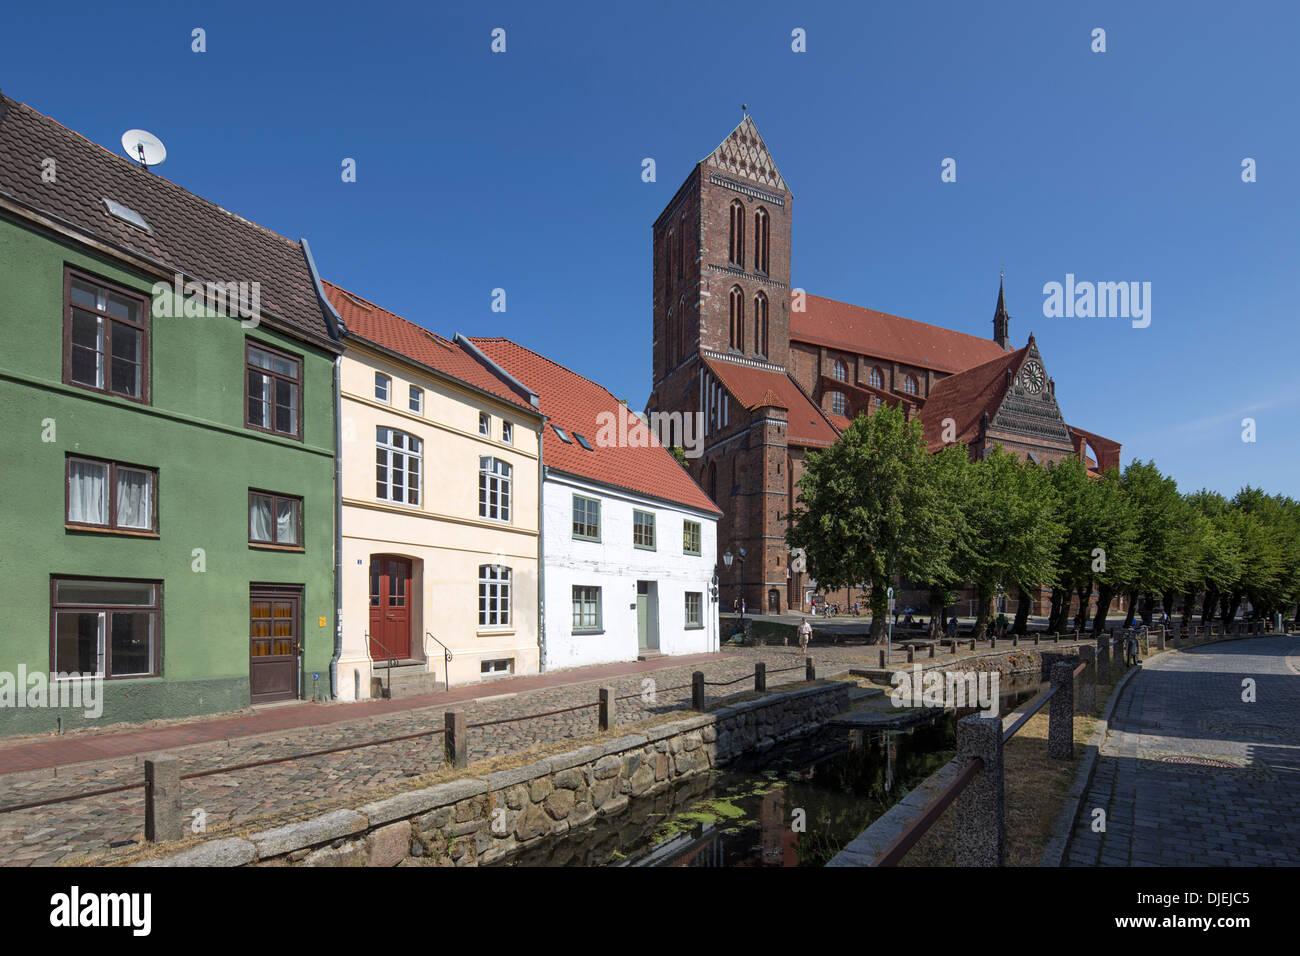 Nikolai church in Wismar, Mecklenburg Vorpommern, Germany - Stock Image